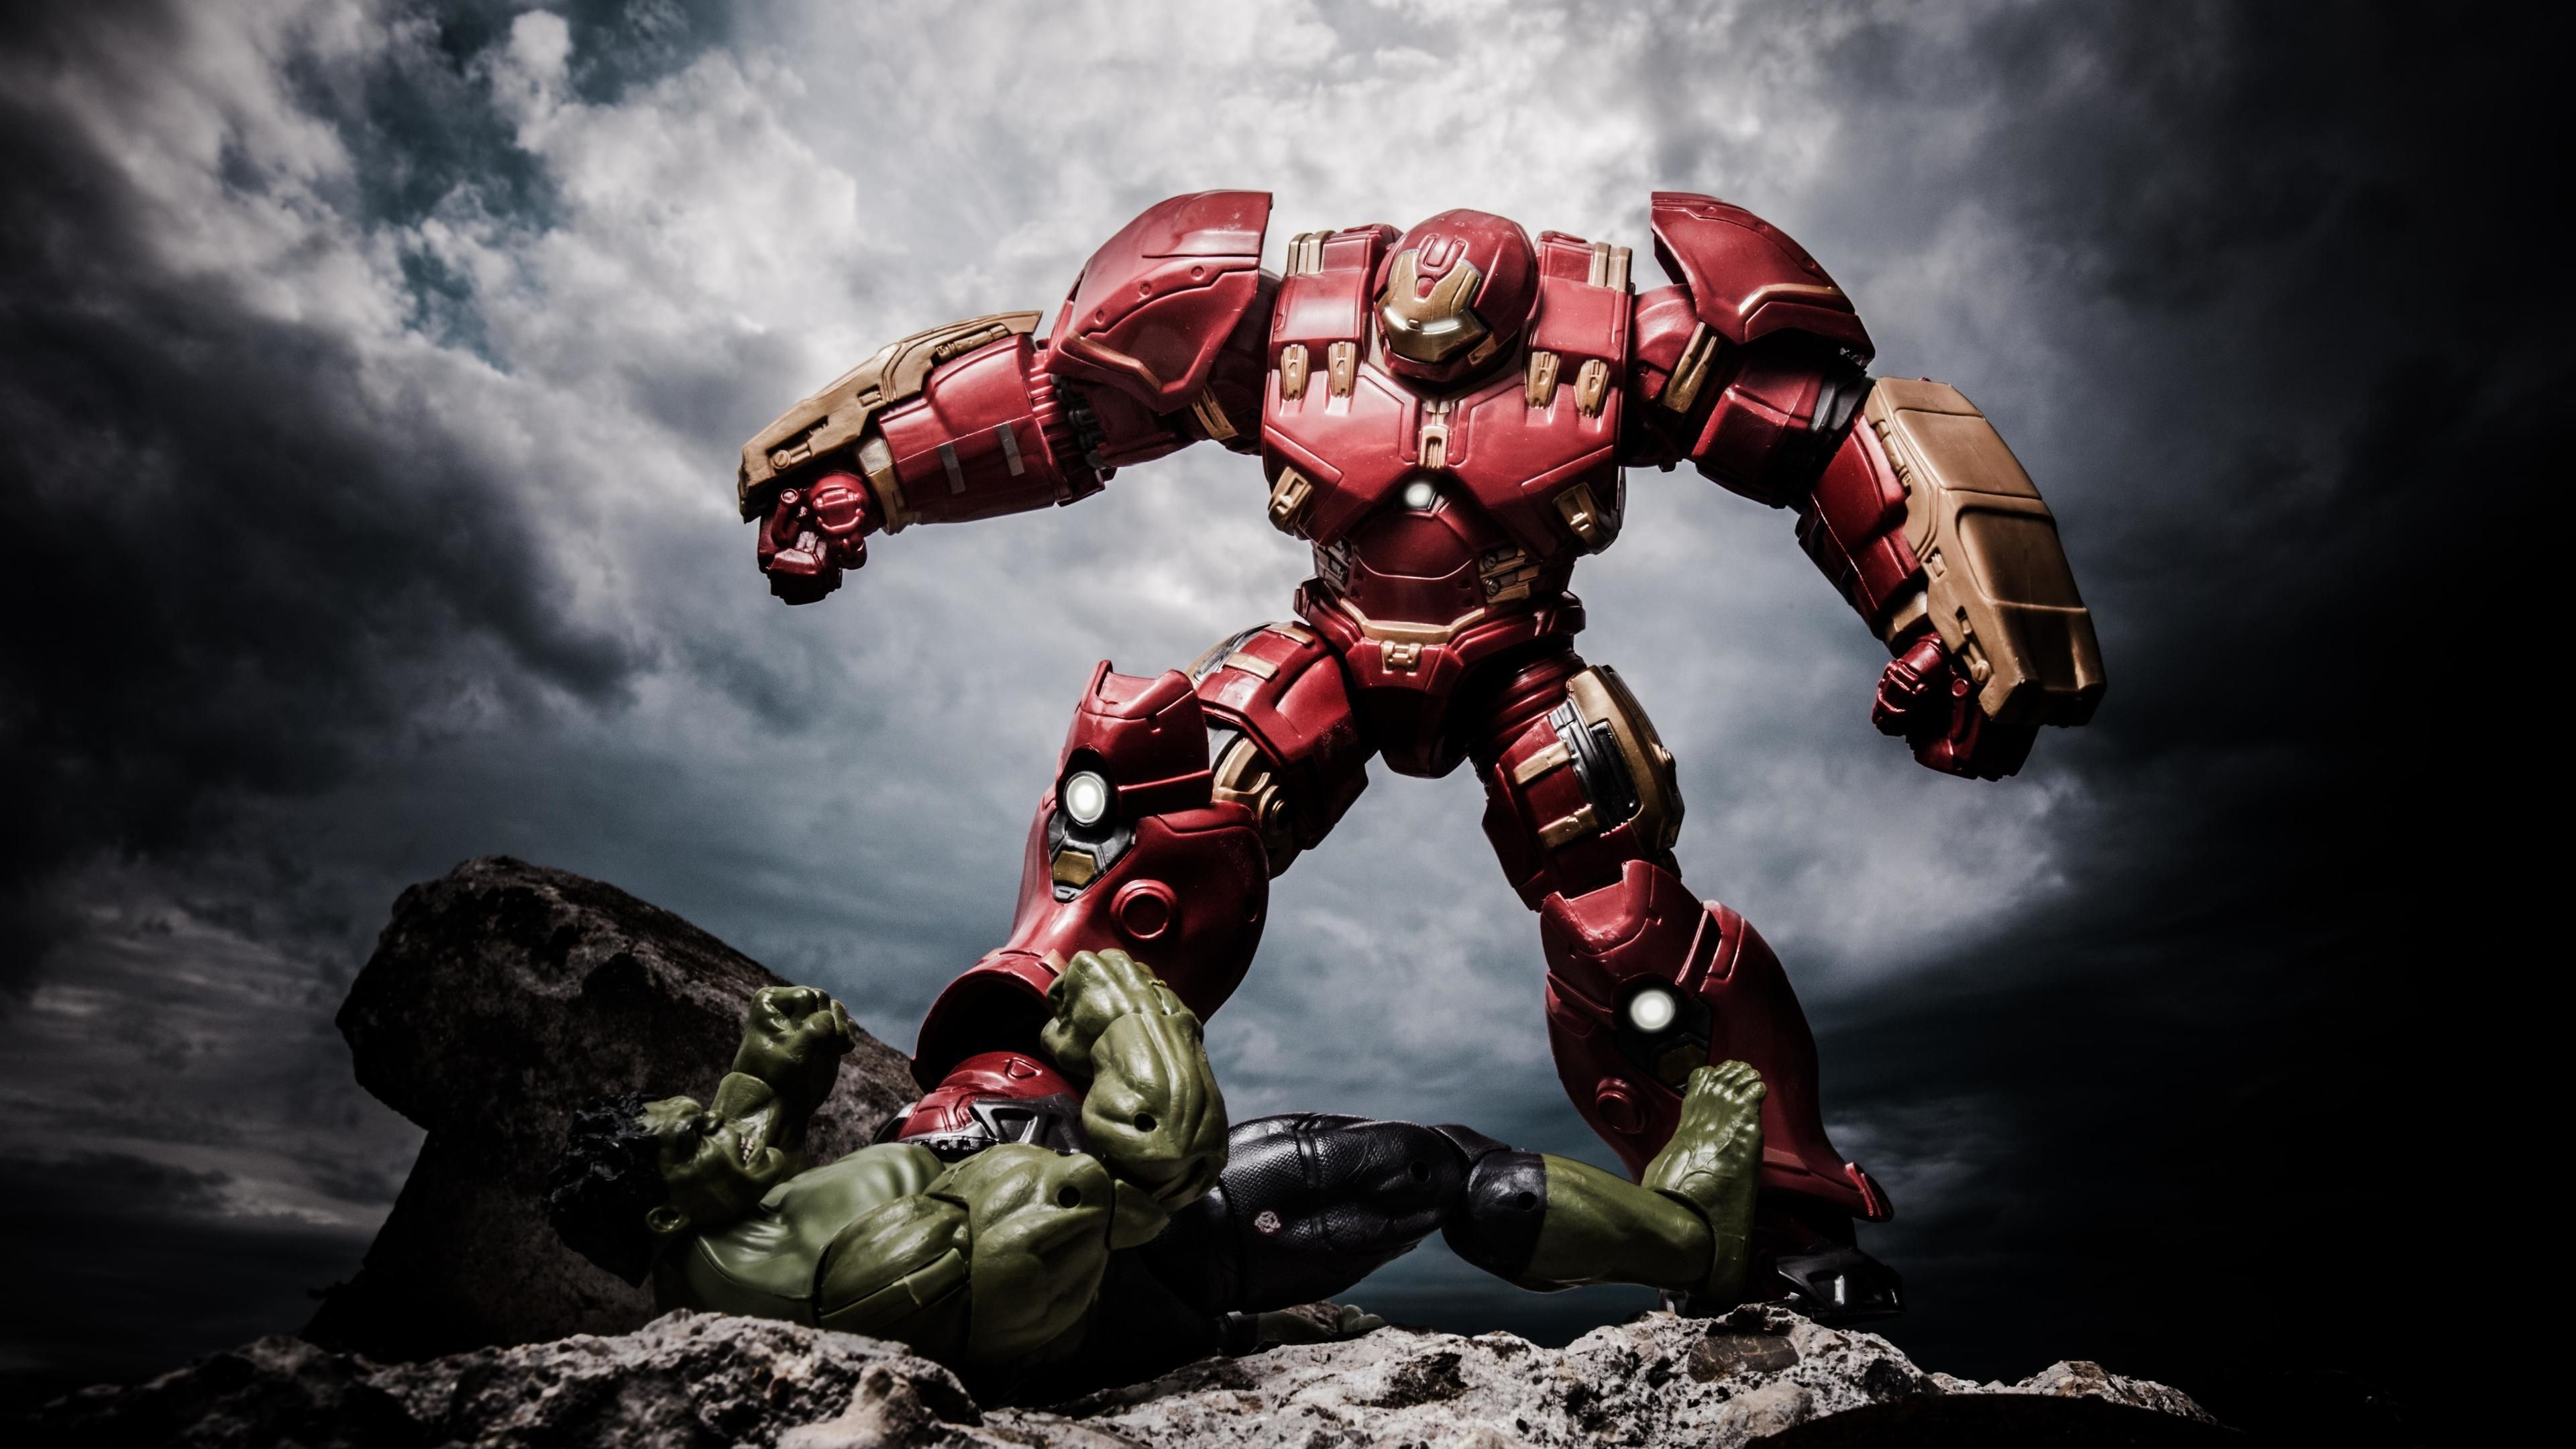 Wallpaper 4k Ironman Hulkbuster Vs The Hulk 4k Wallpapers 5k